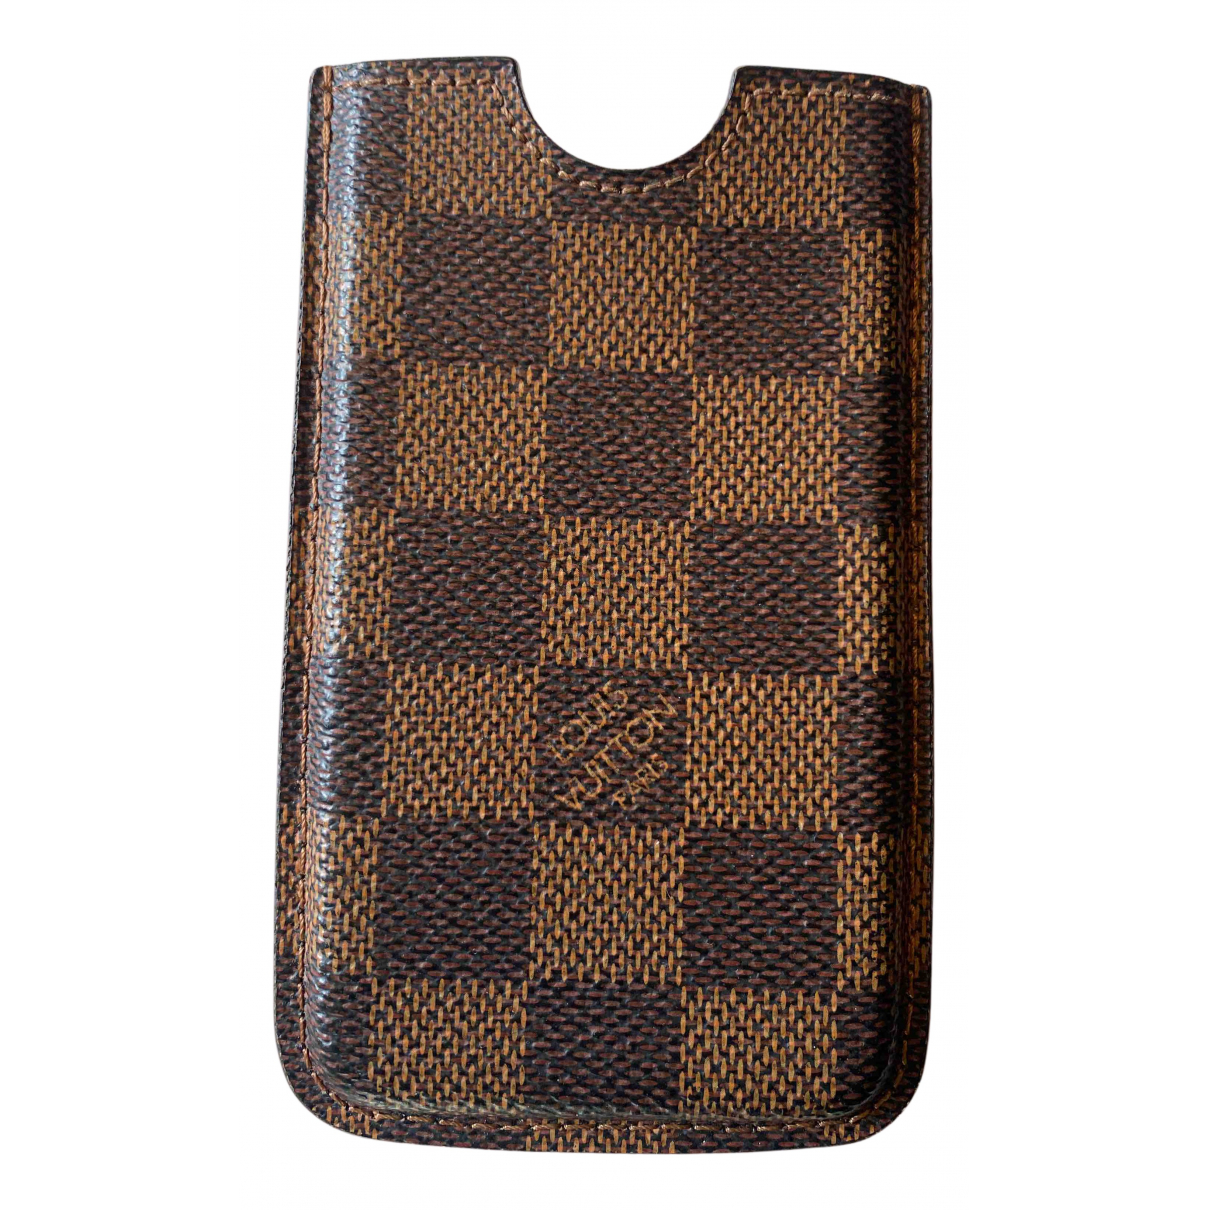 Louis Vuitton N Brown Cloth Accessories for Life & Living N